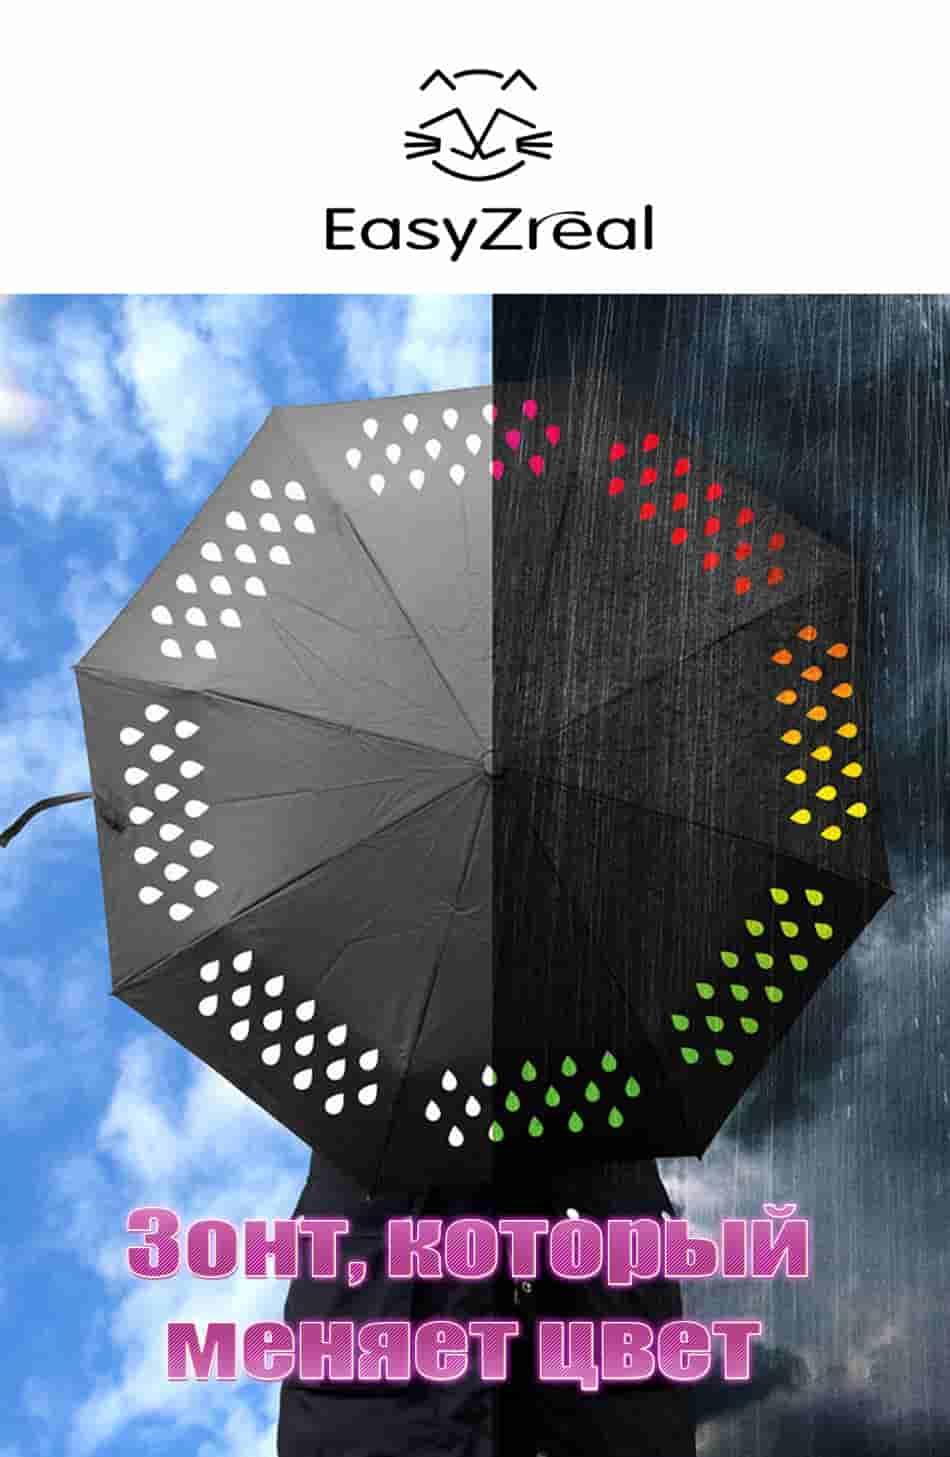 Зонт, который меняет цвет